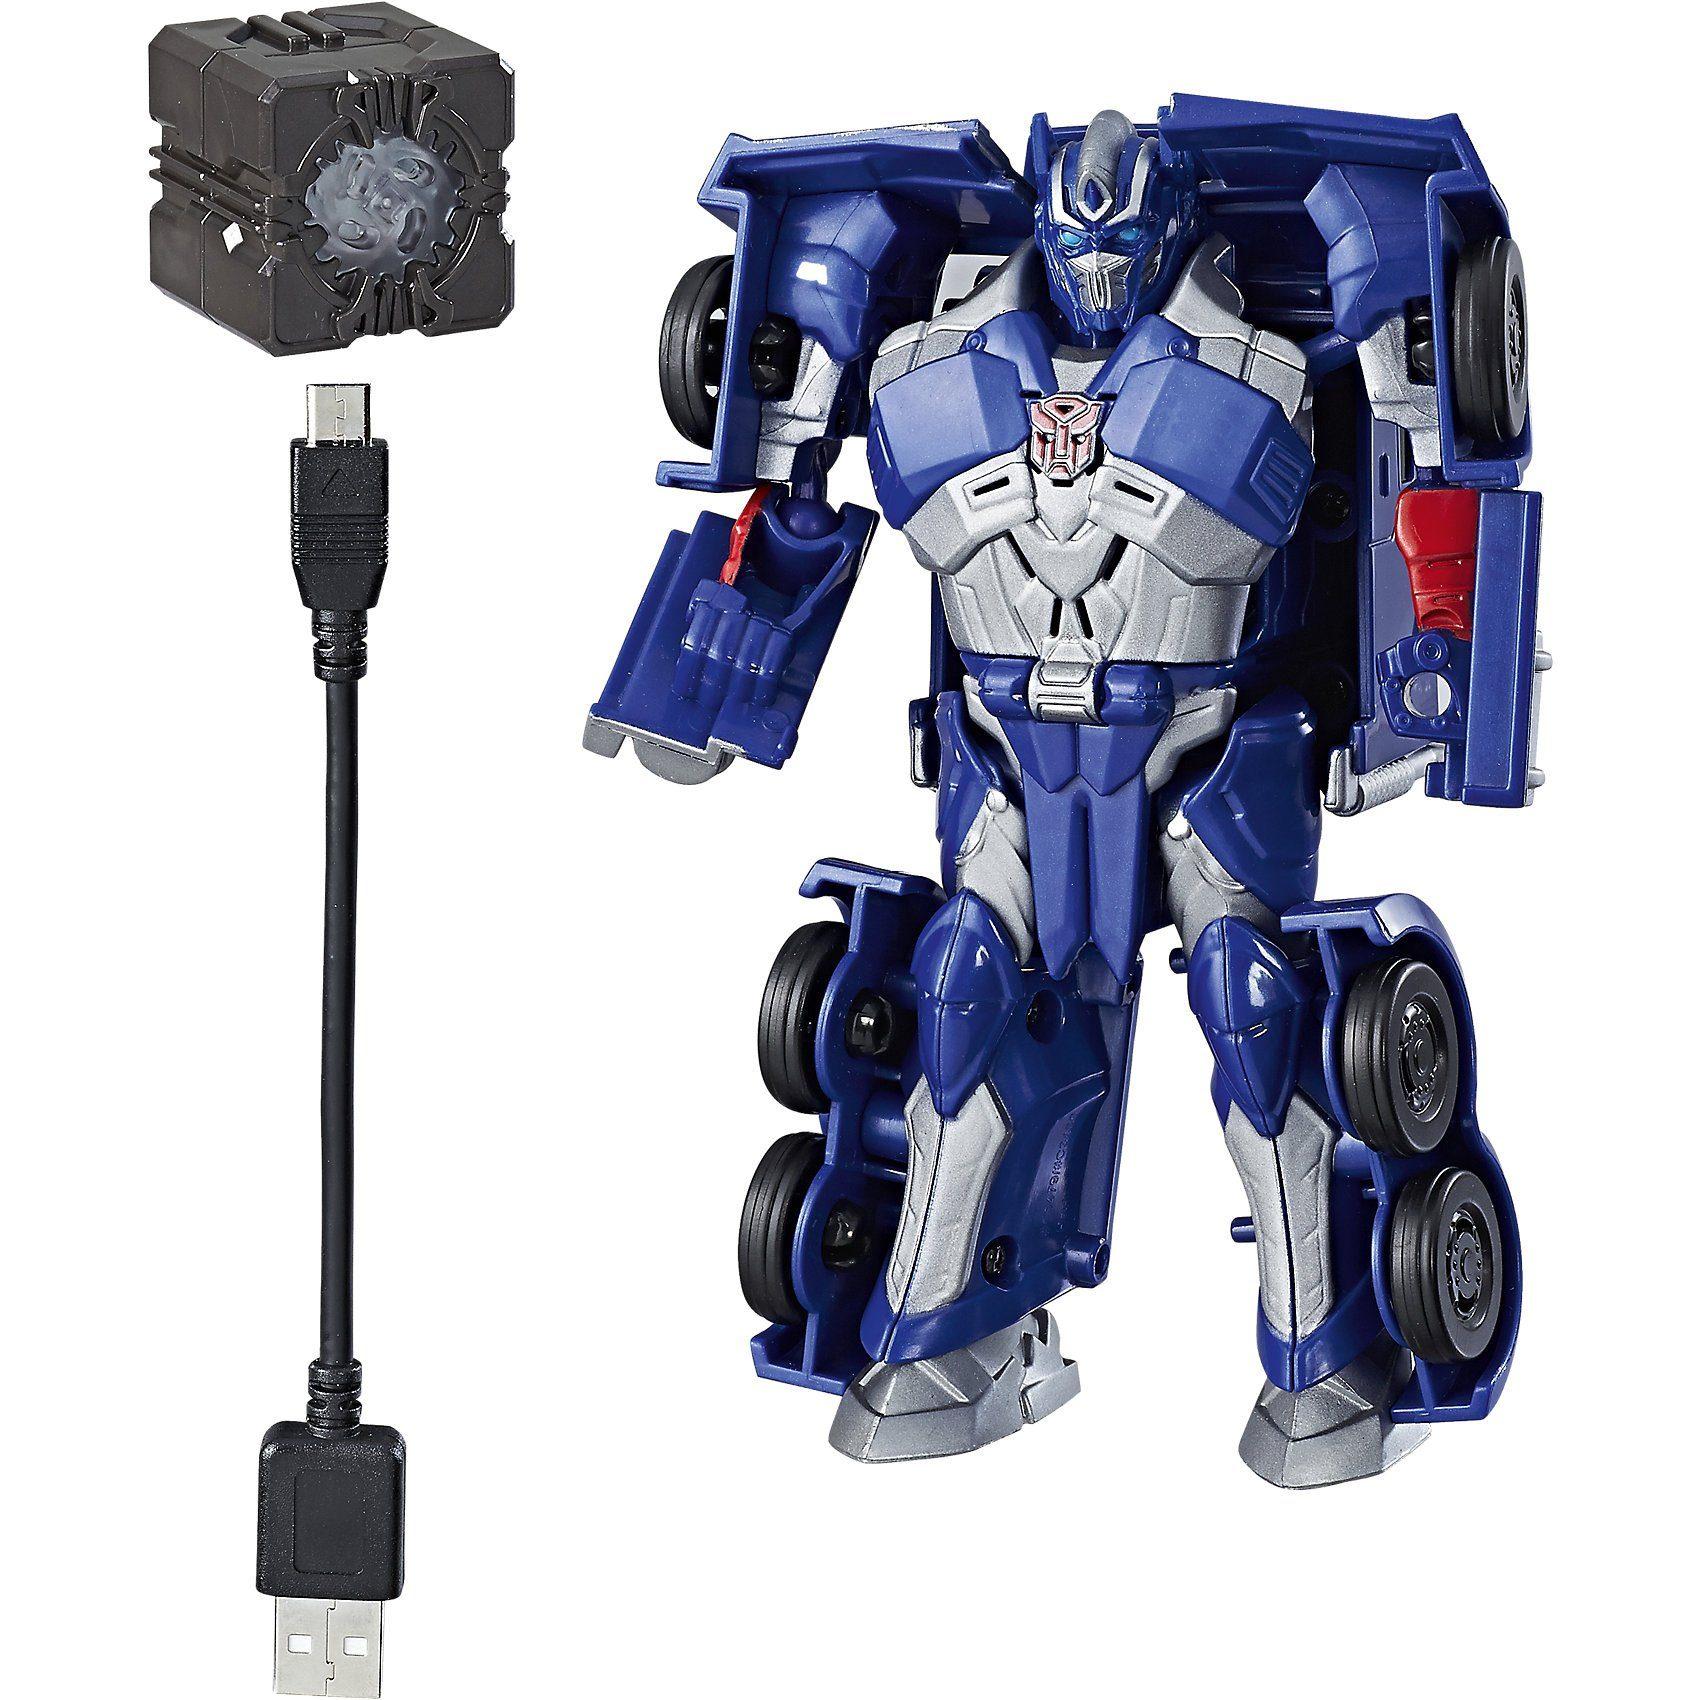 Hasbro Transformers Movie 5 All Spark Tech Starter Set Optimus Prim